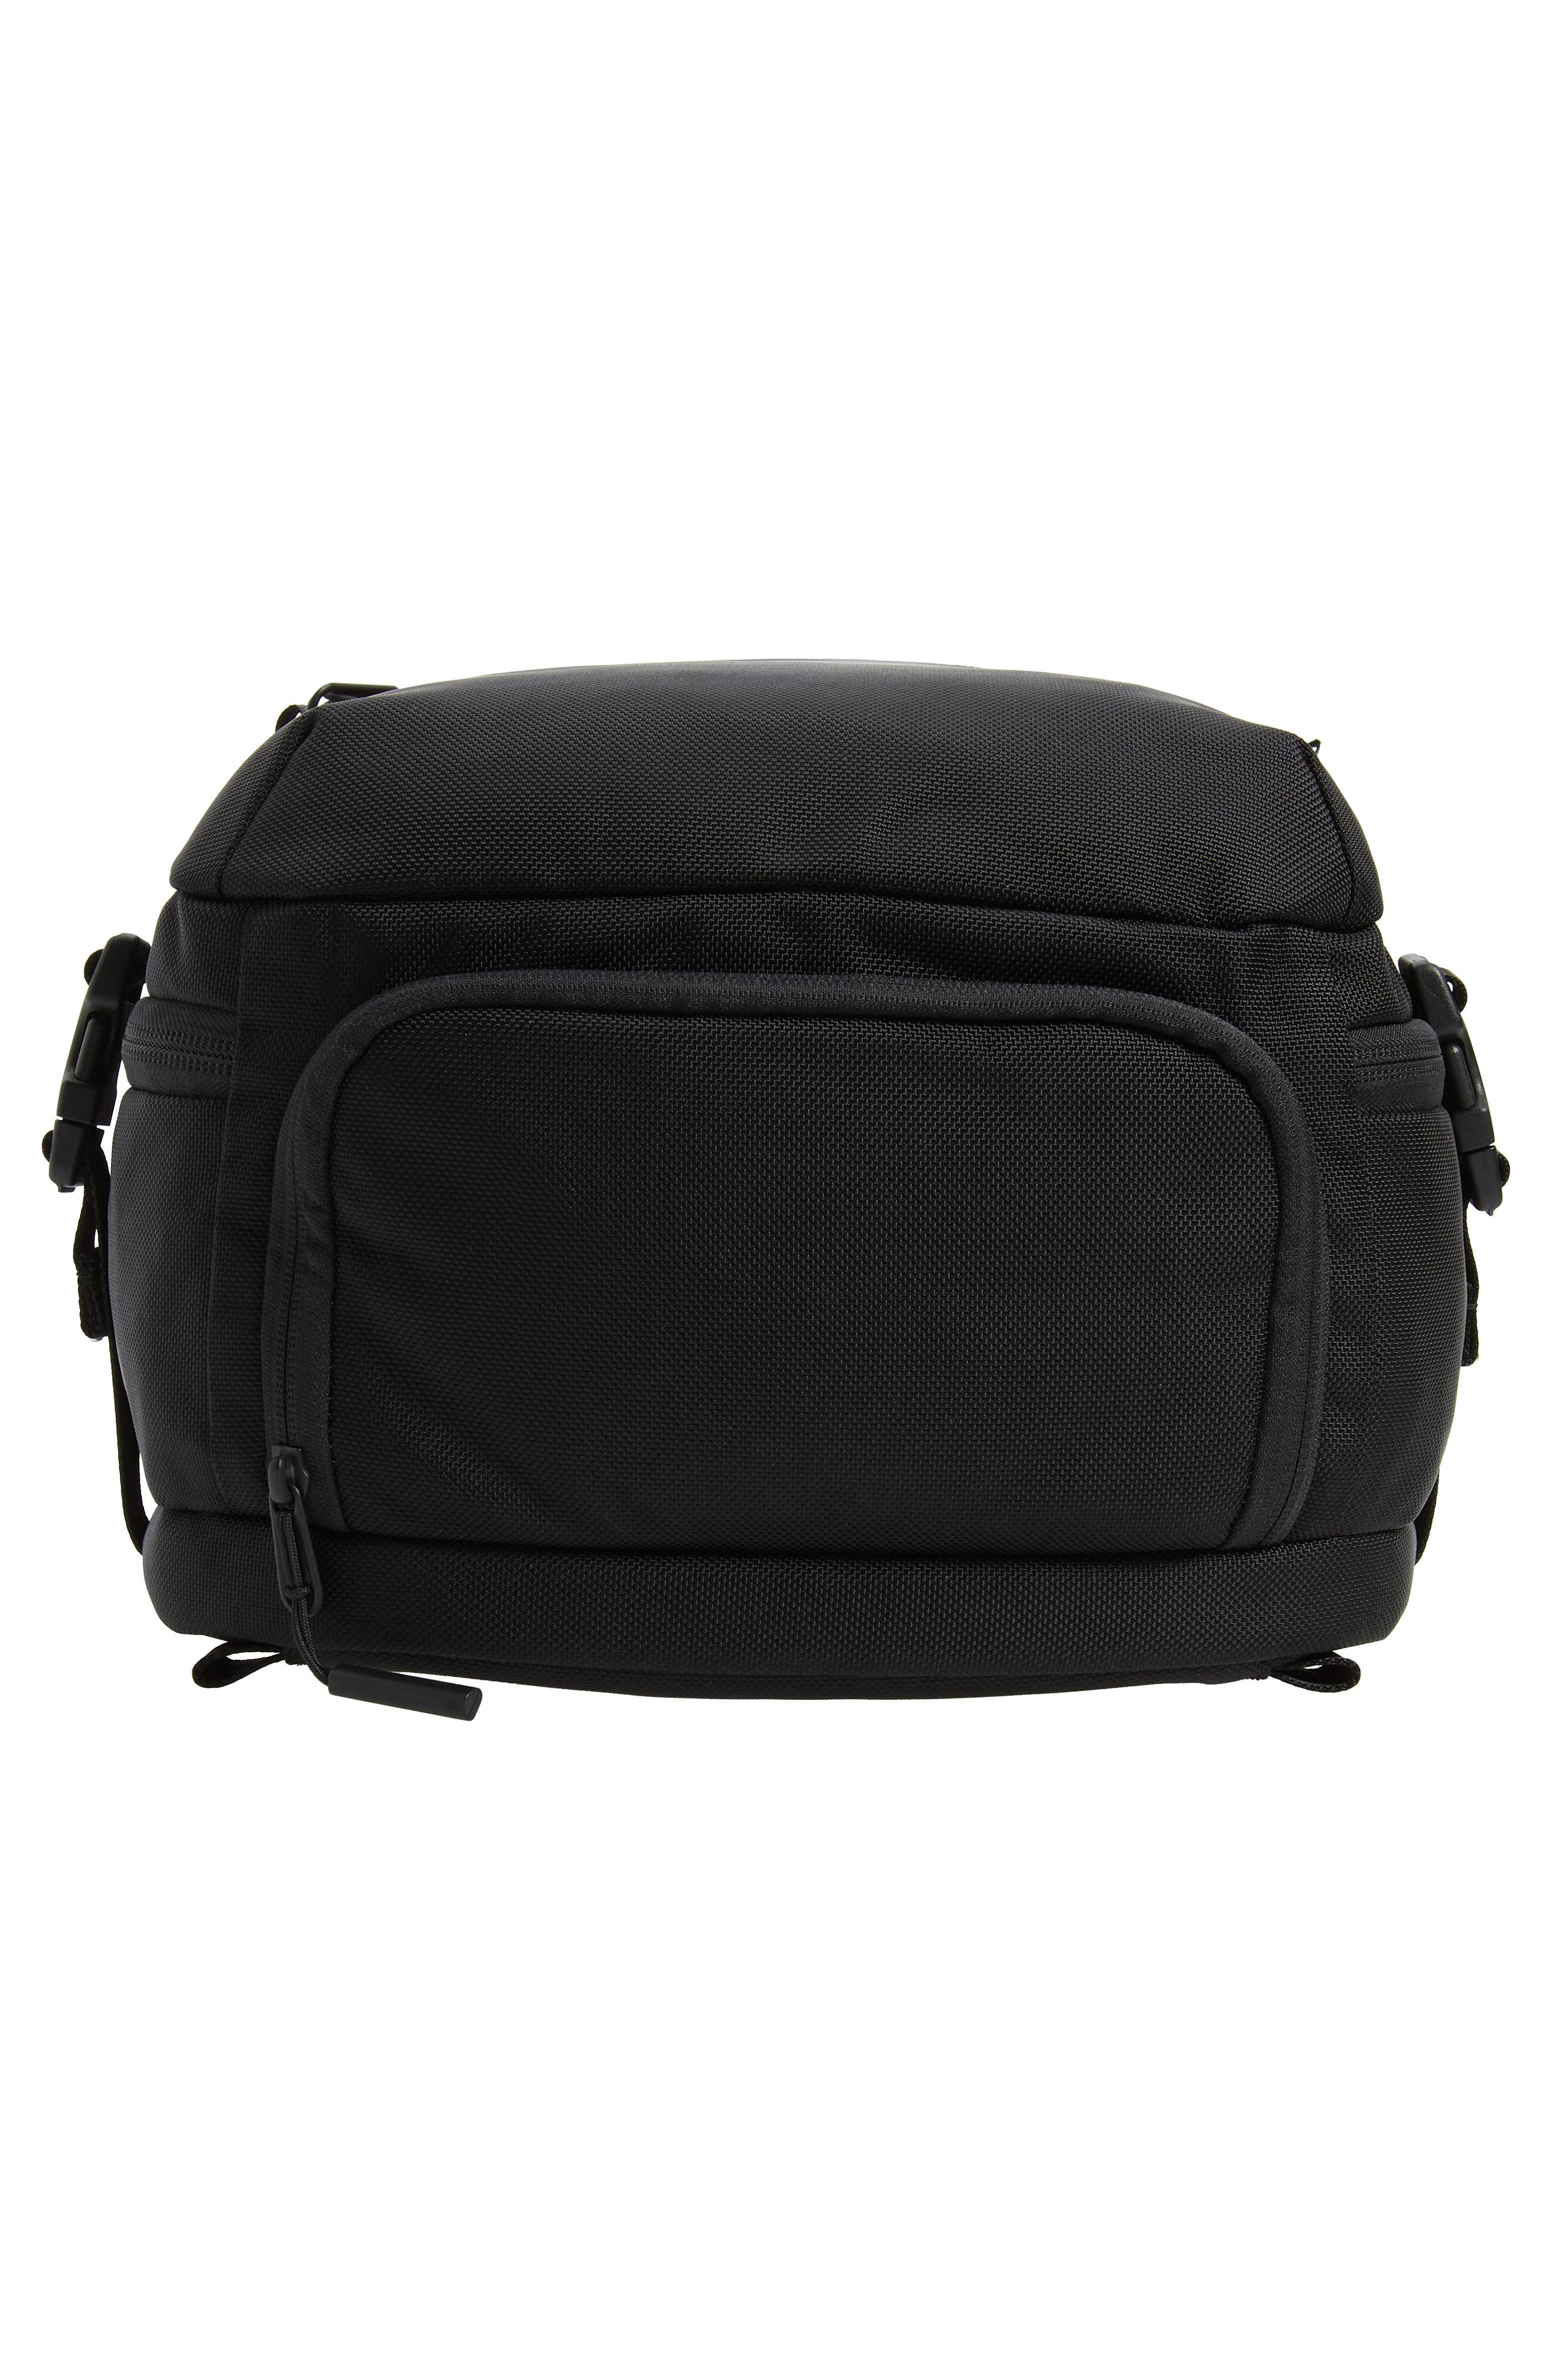 Travel Pack 2 Backpack,                             Alternate thumbnail 6, color,                             BLACK